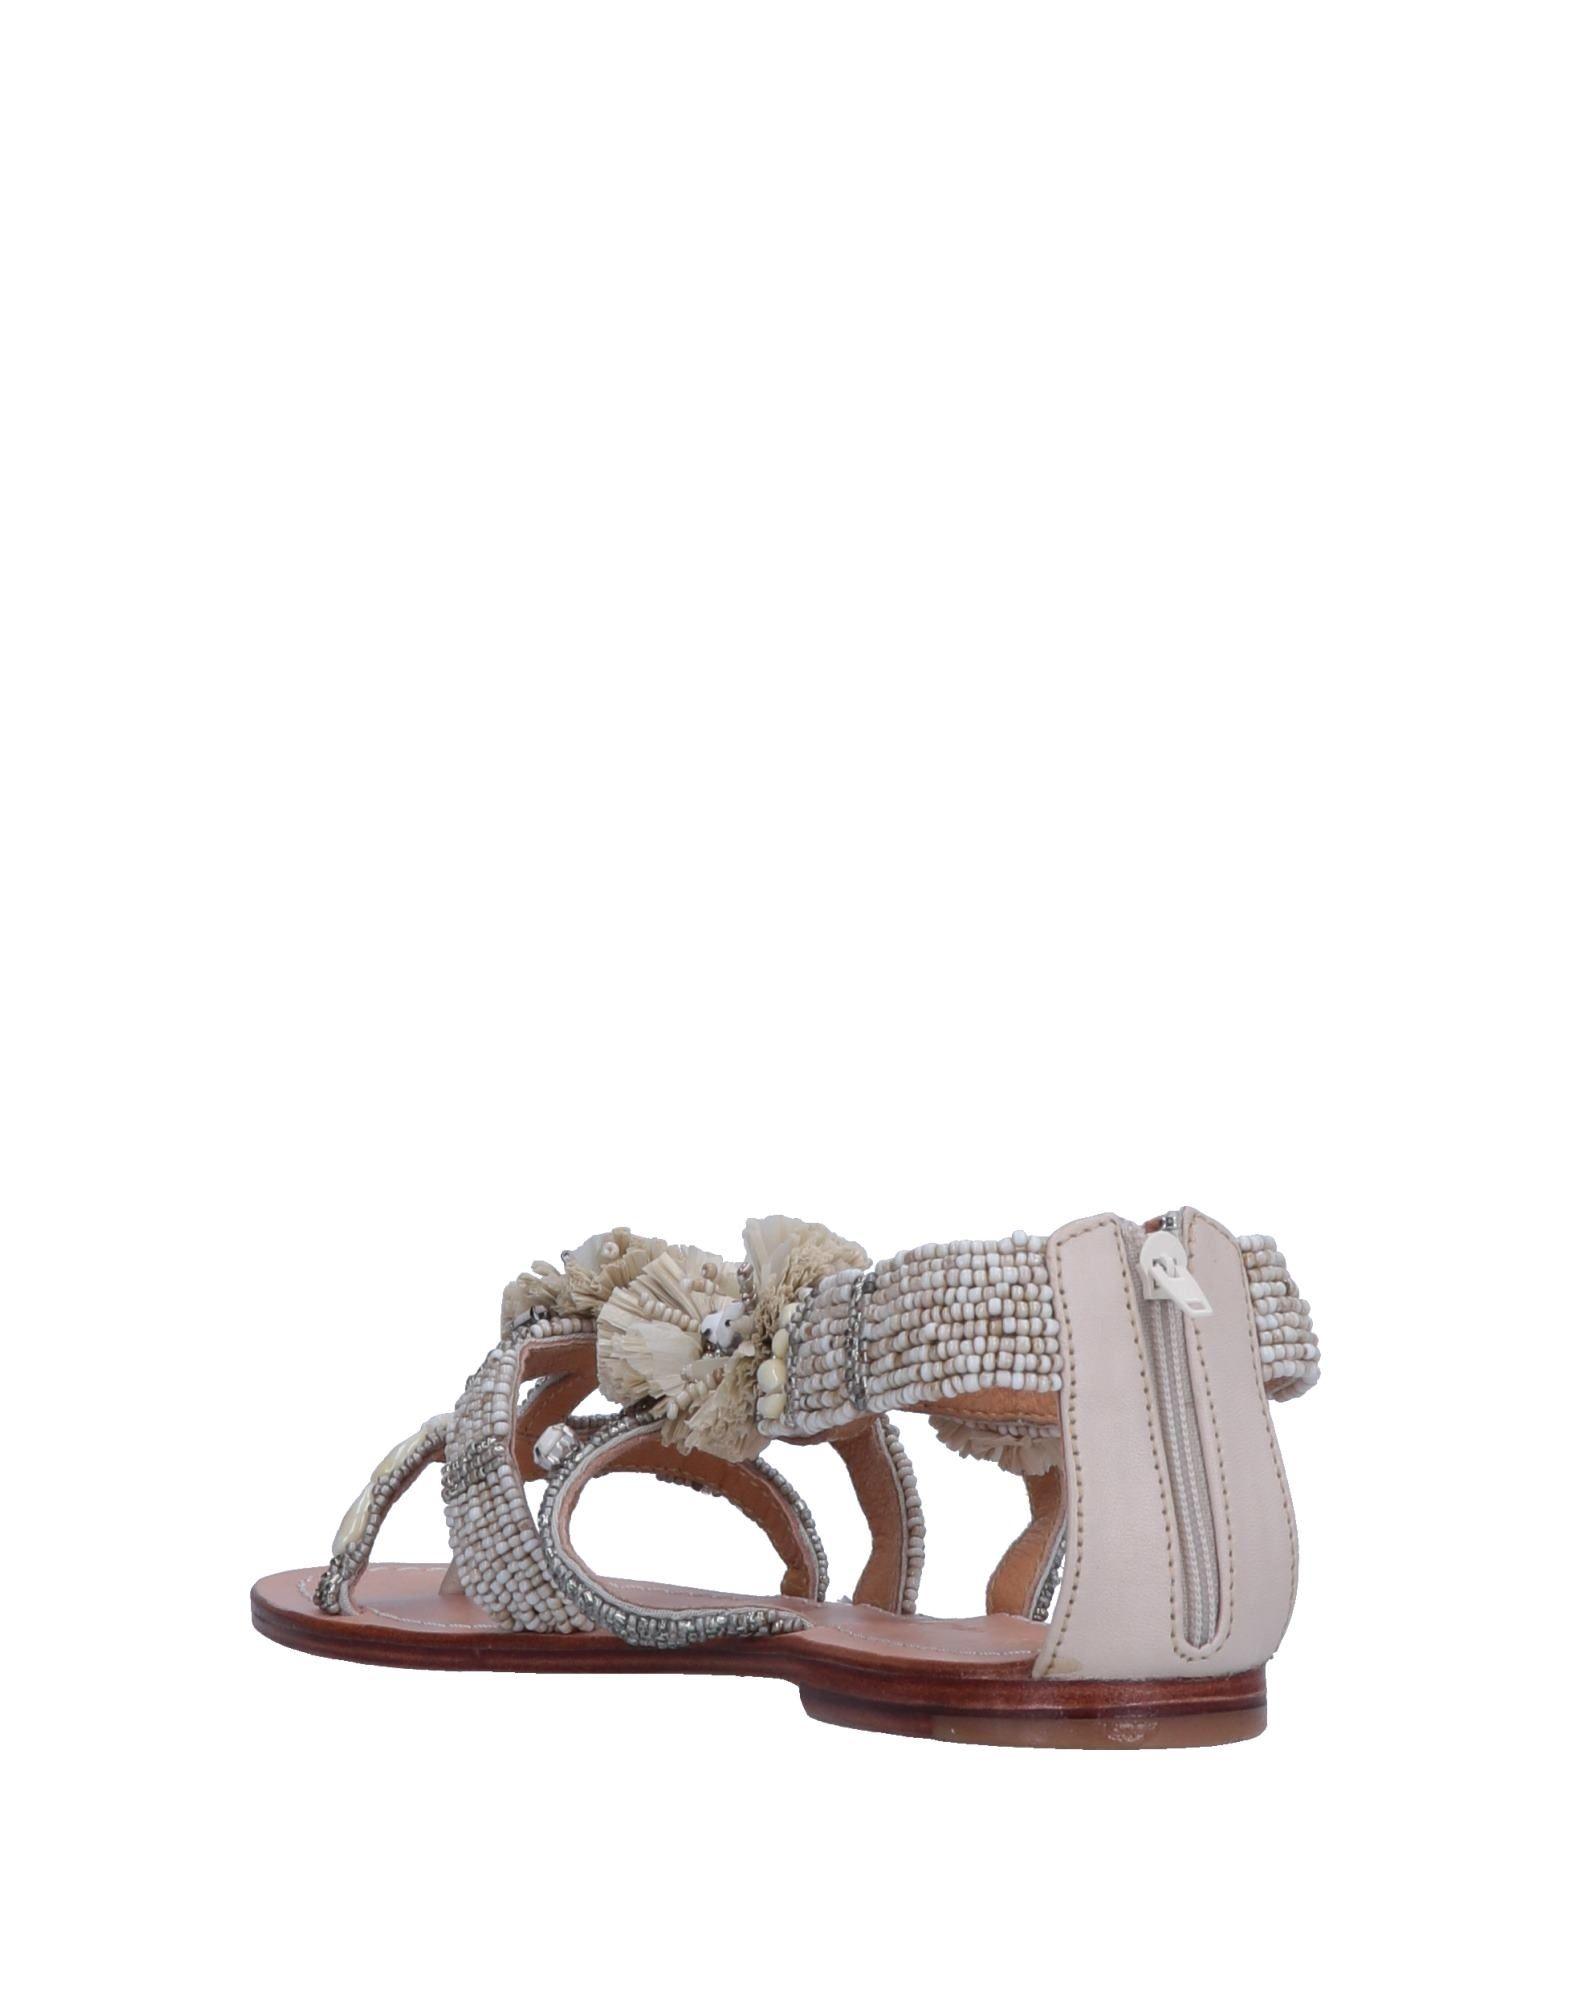 Malìparmi 11557763BS Dianetten Damen  11557763BS Malìparmi Gute Qualität beliebte Schuhe bf3c44